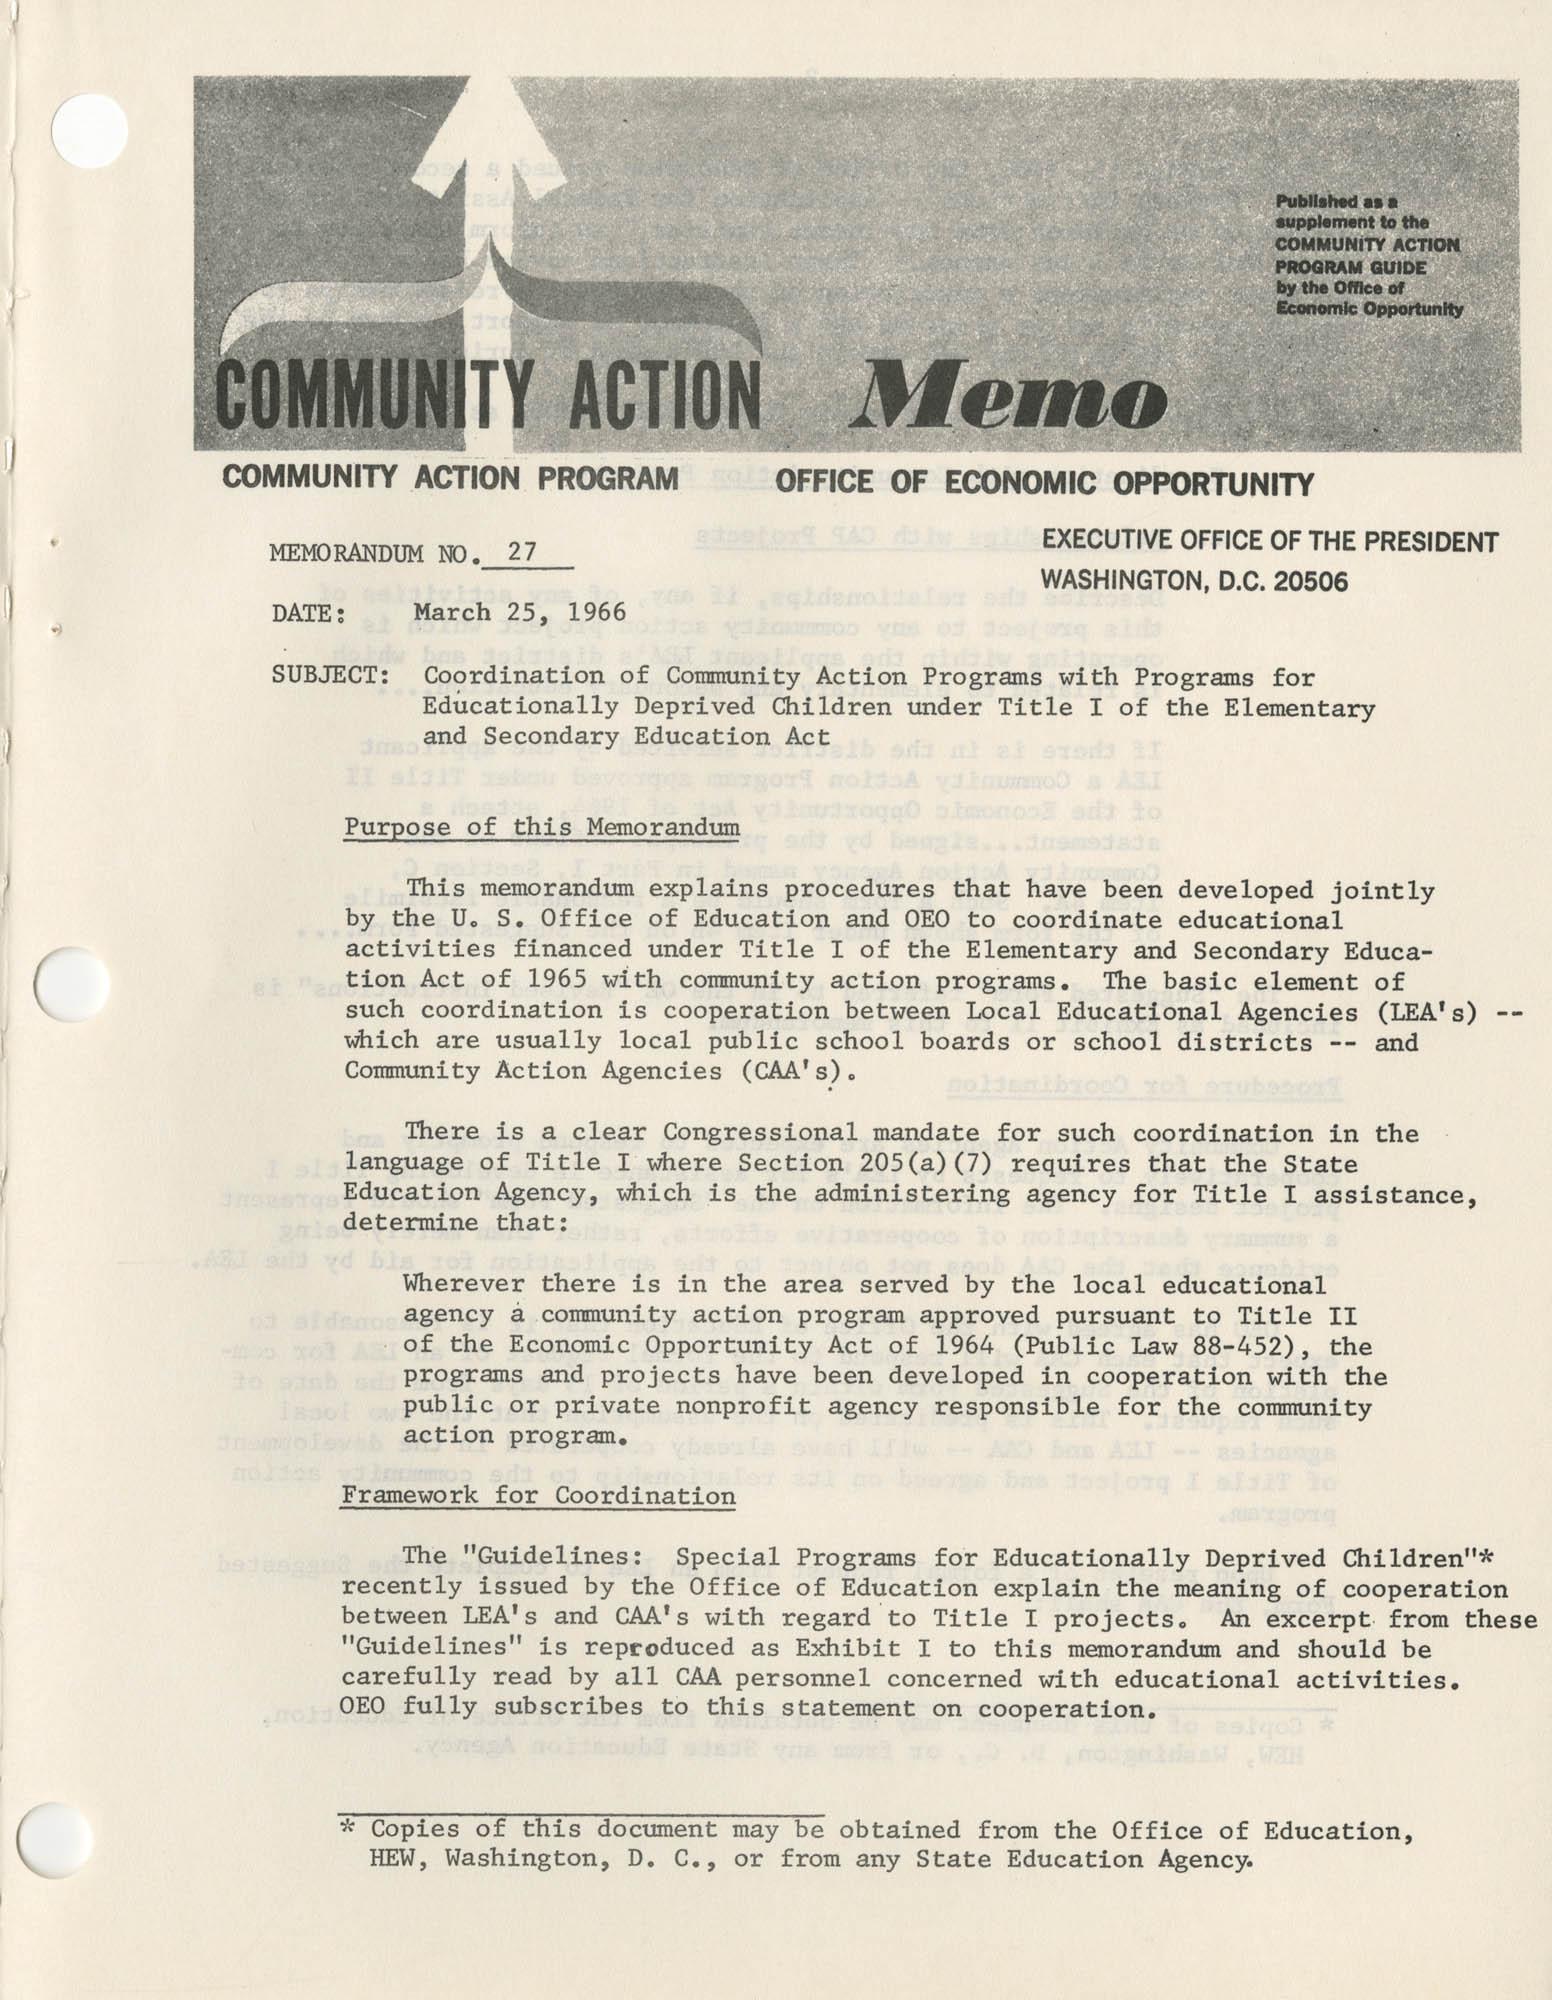 Community Action Program Memorandum No. 27, Memo Page 1